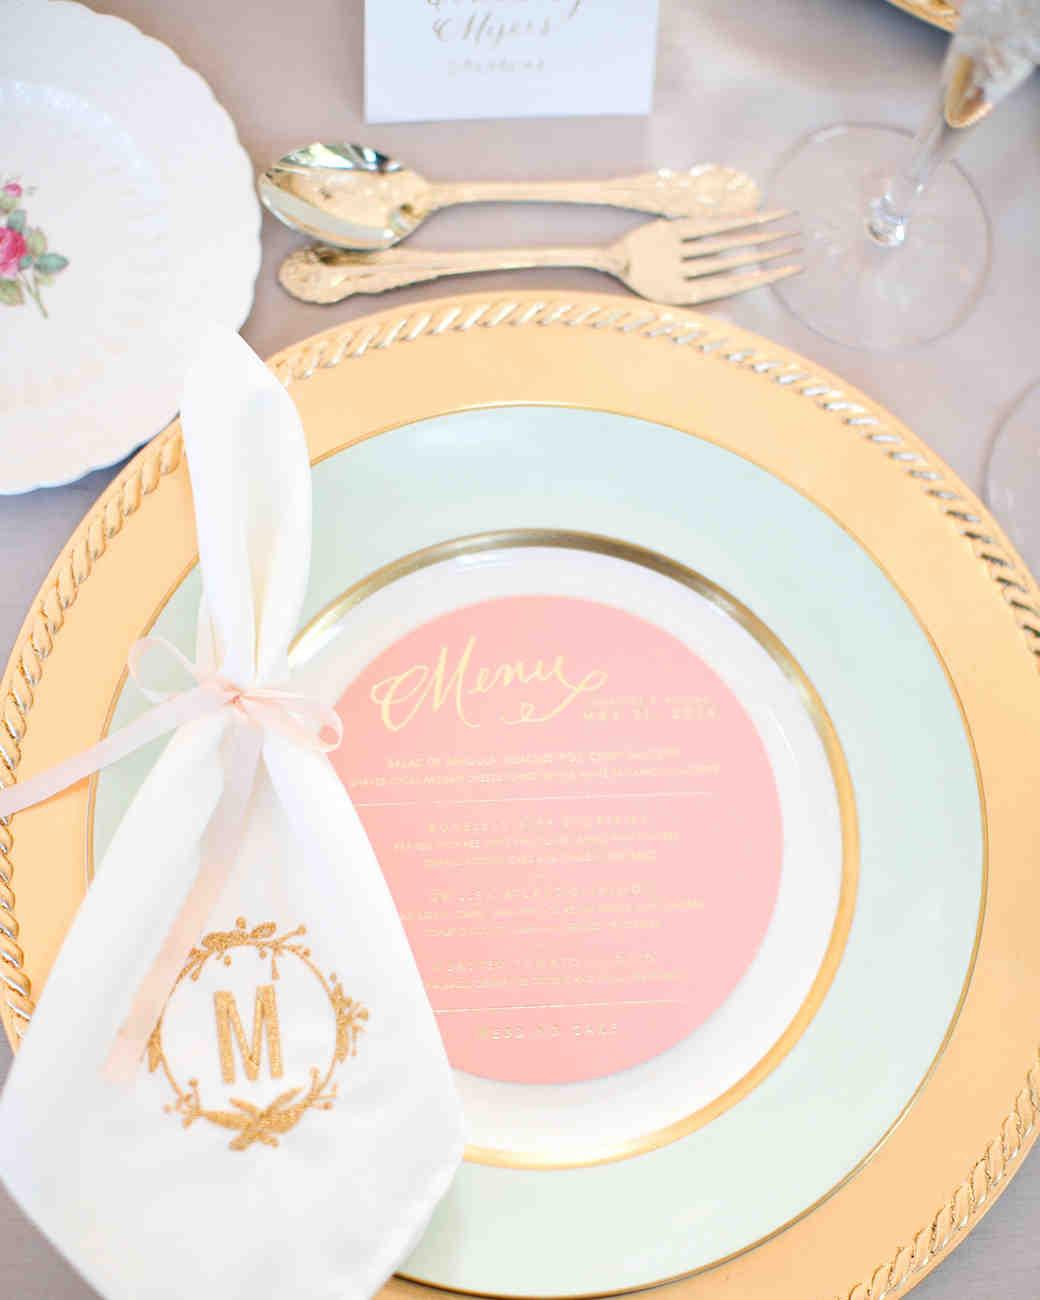 courtney-michael-wedding-16-s111677-0215.jpg